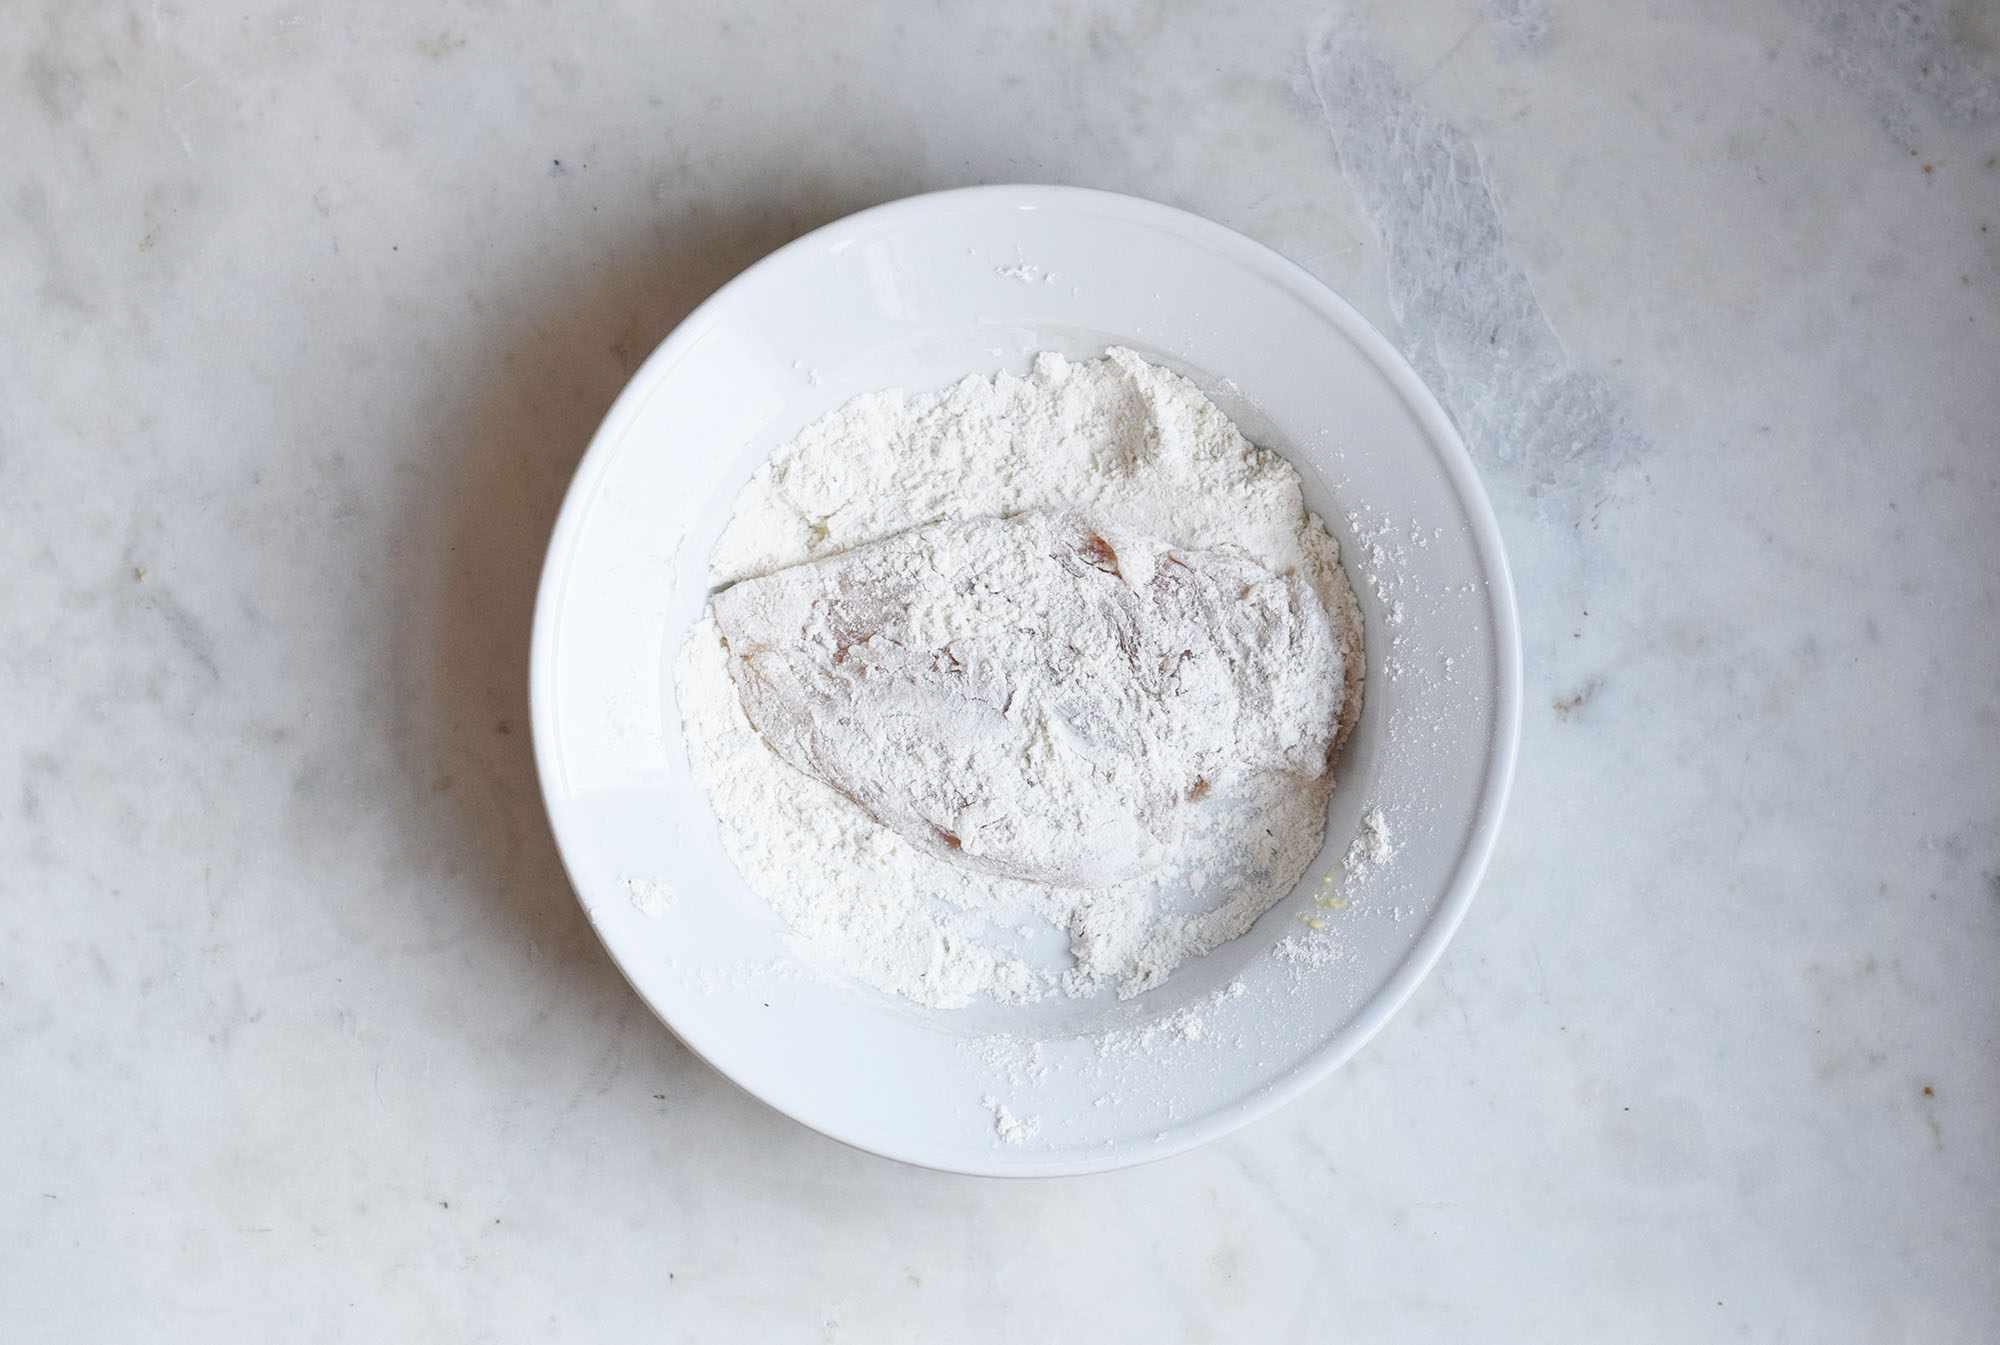 chicken dipped in flour mixture